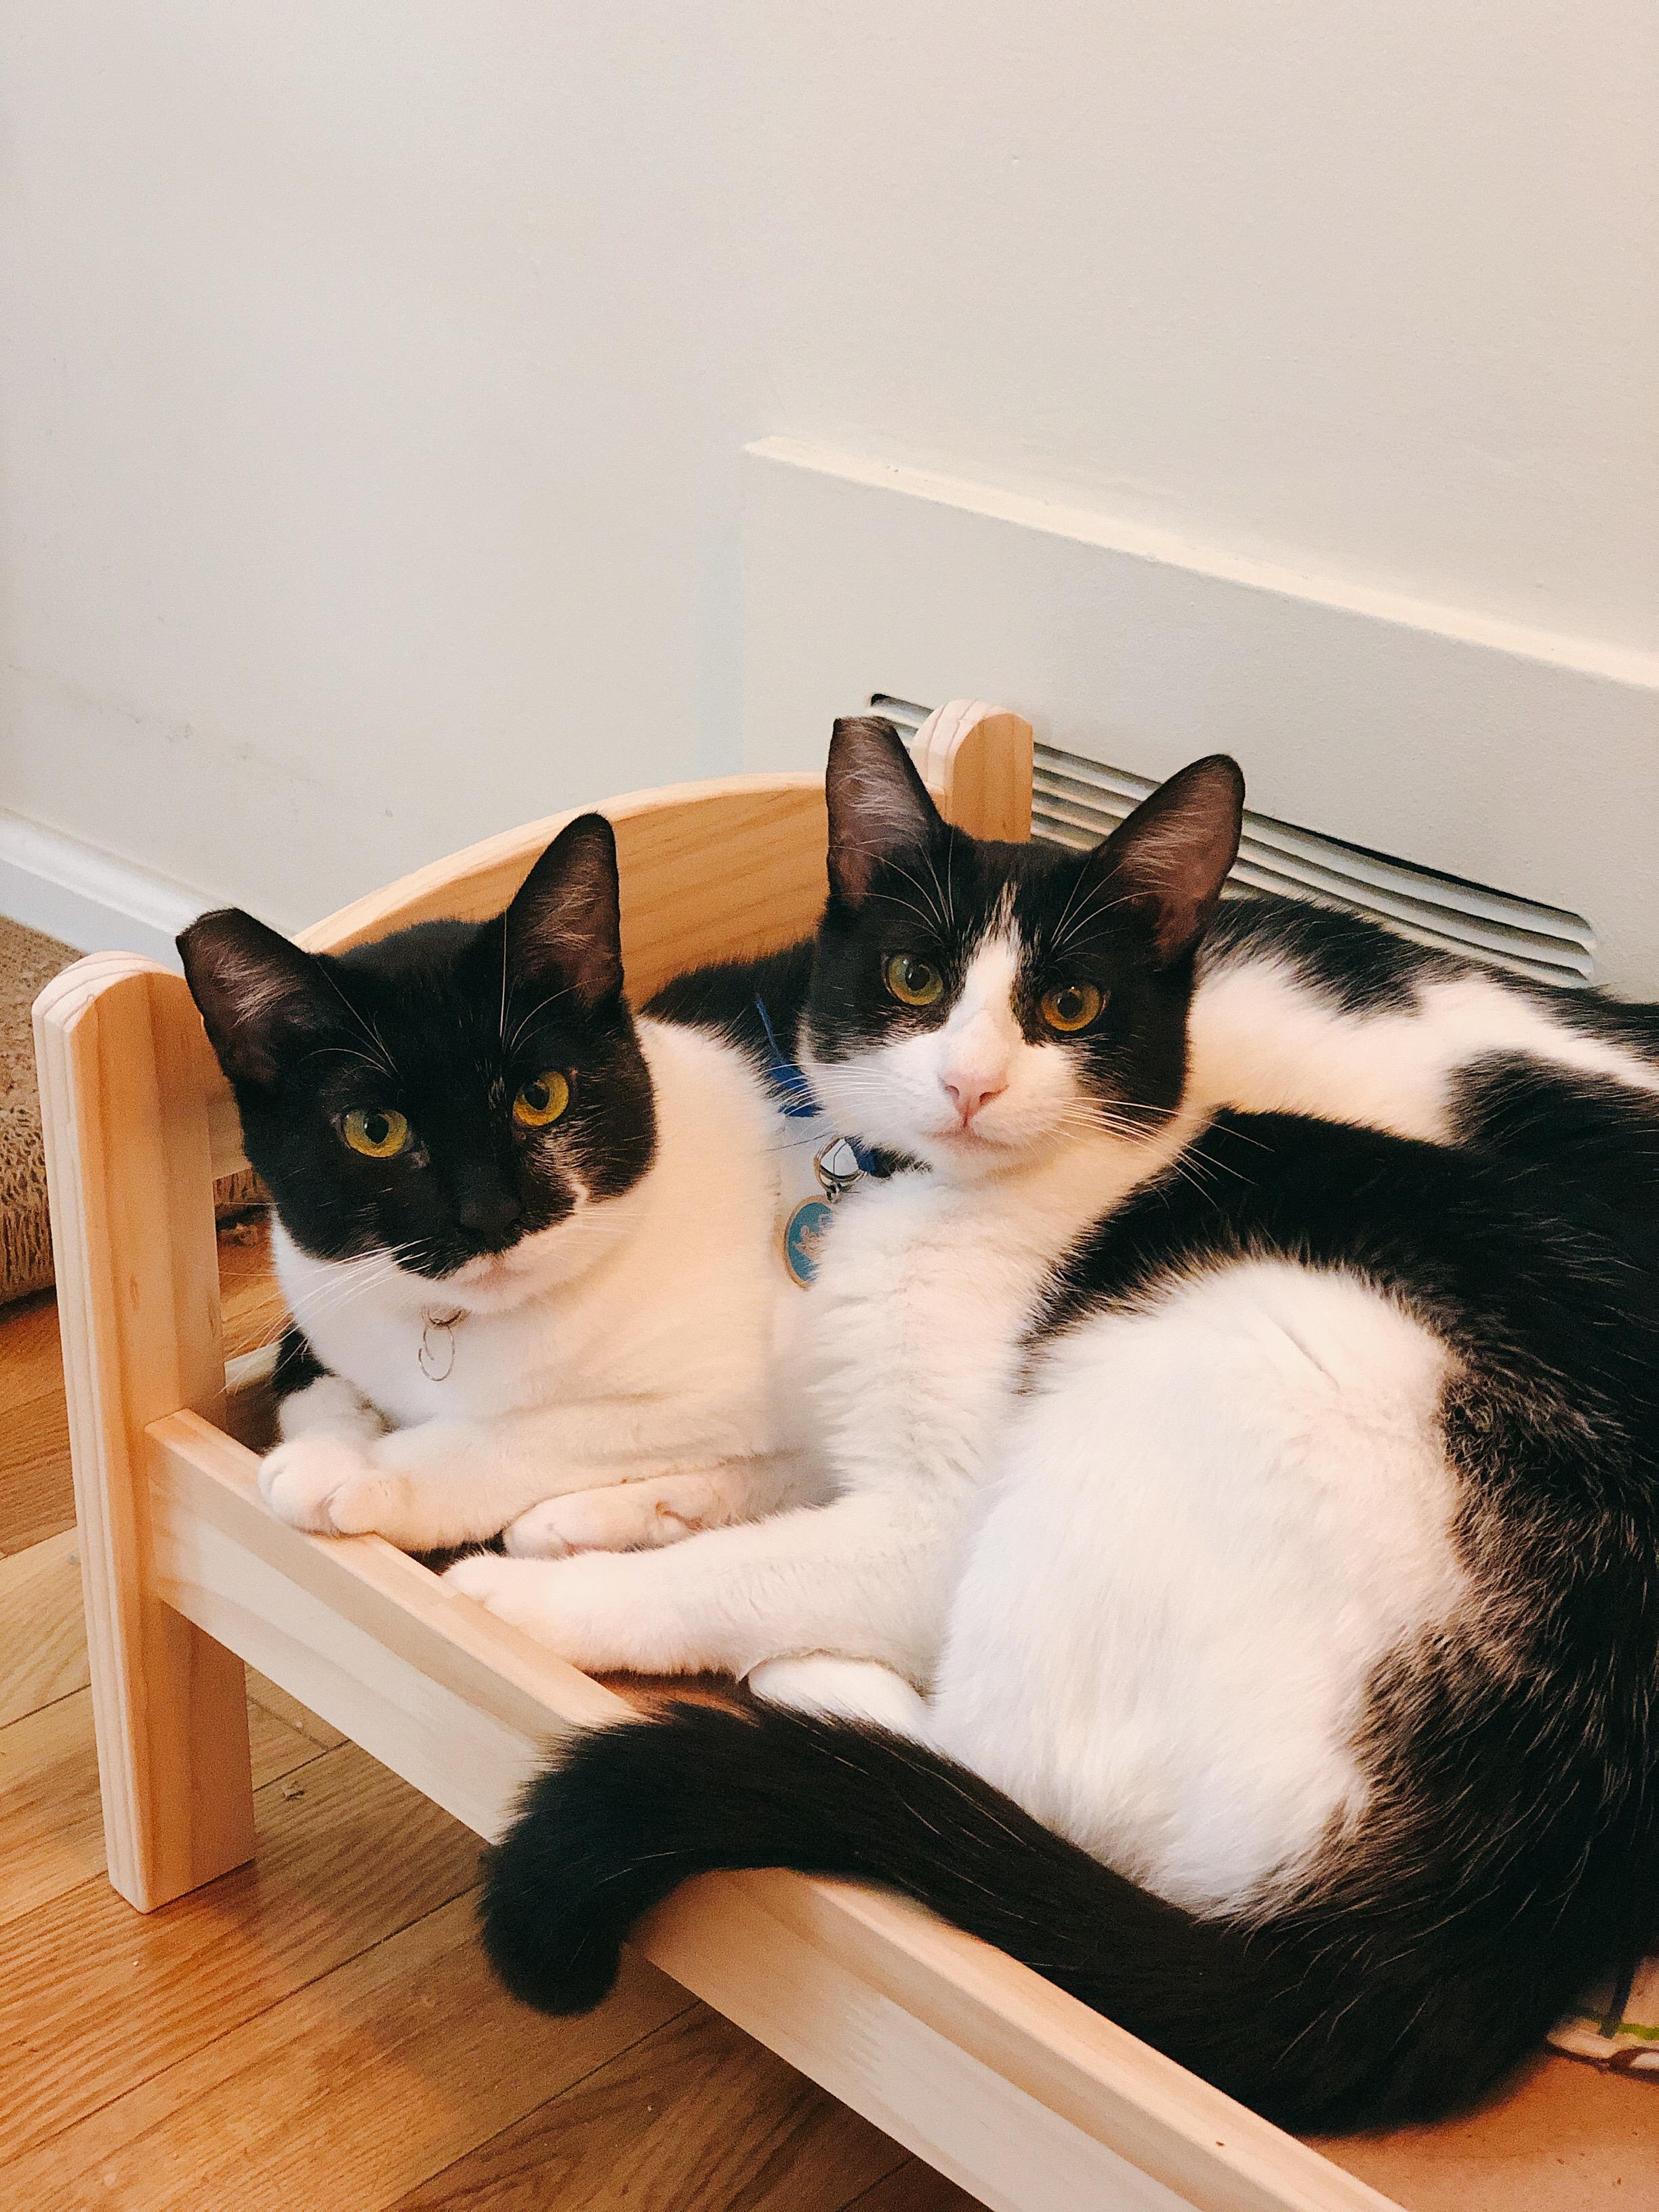 Oreo and Cookie - needs a home ASAP (LA | OC)